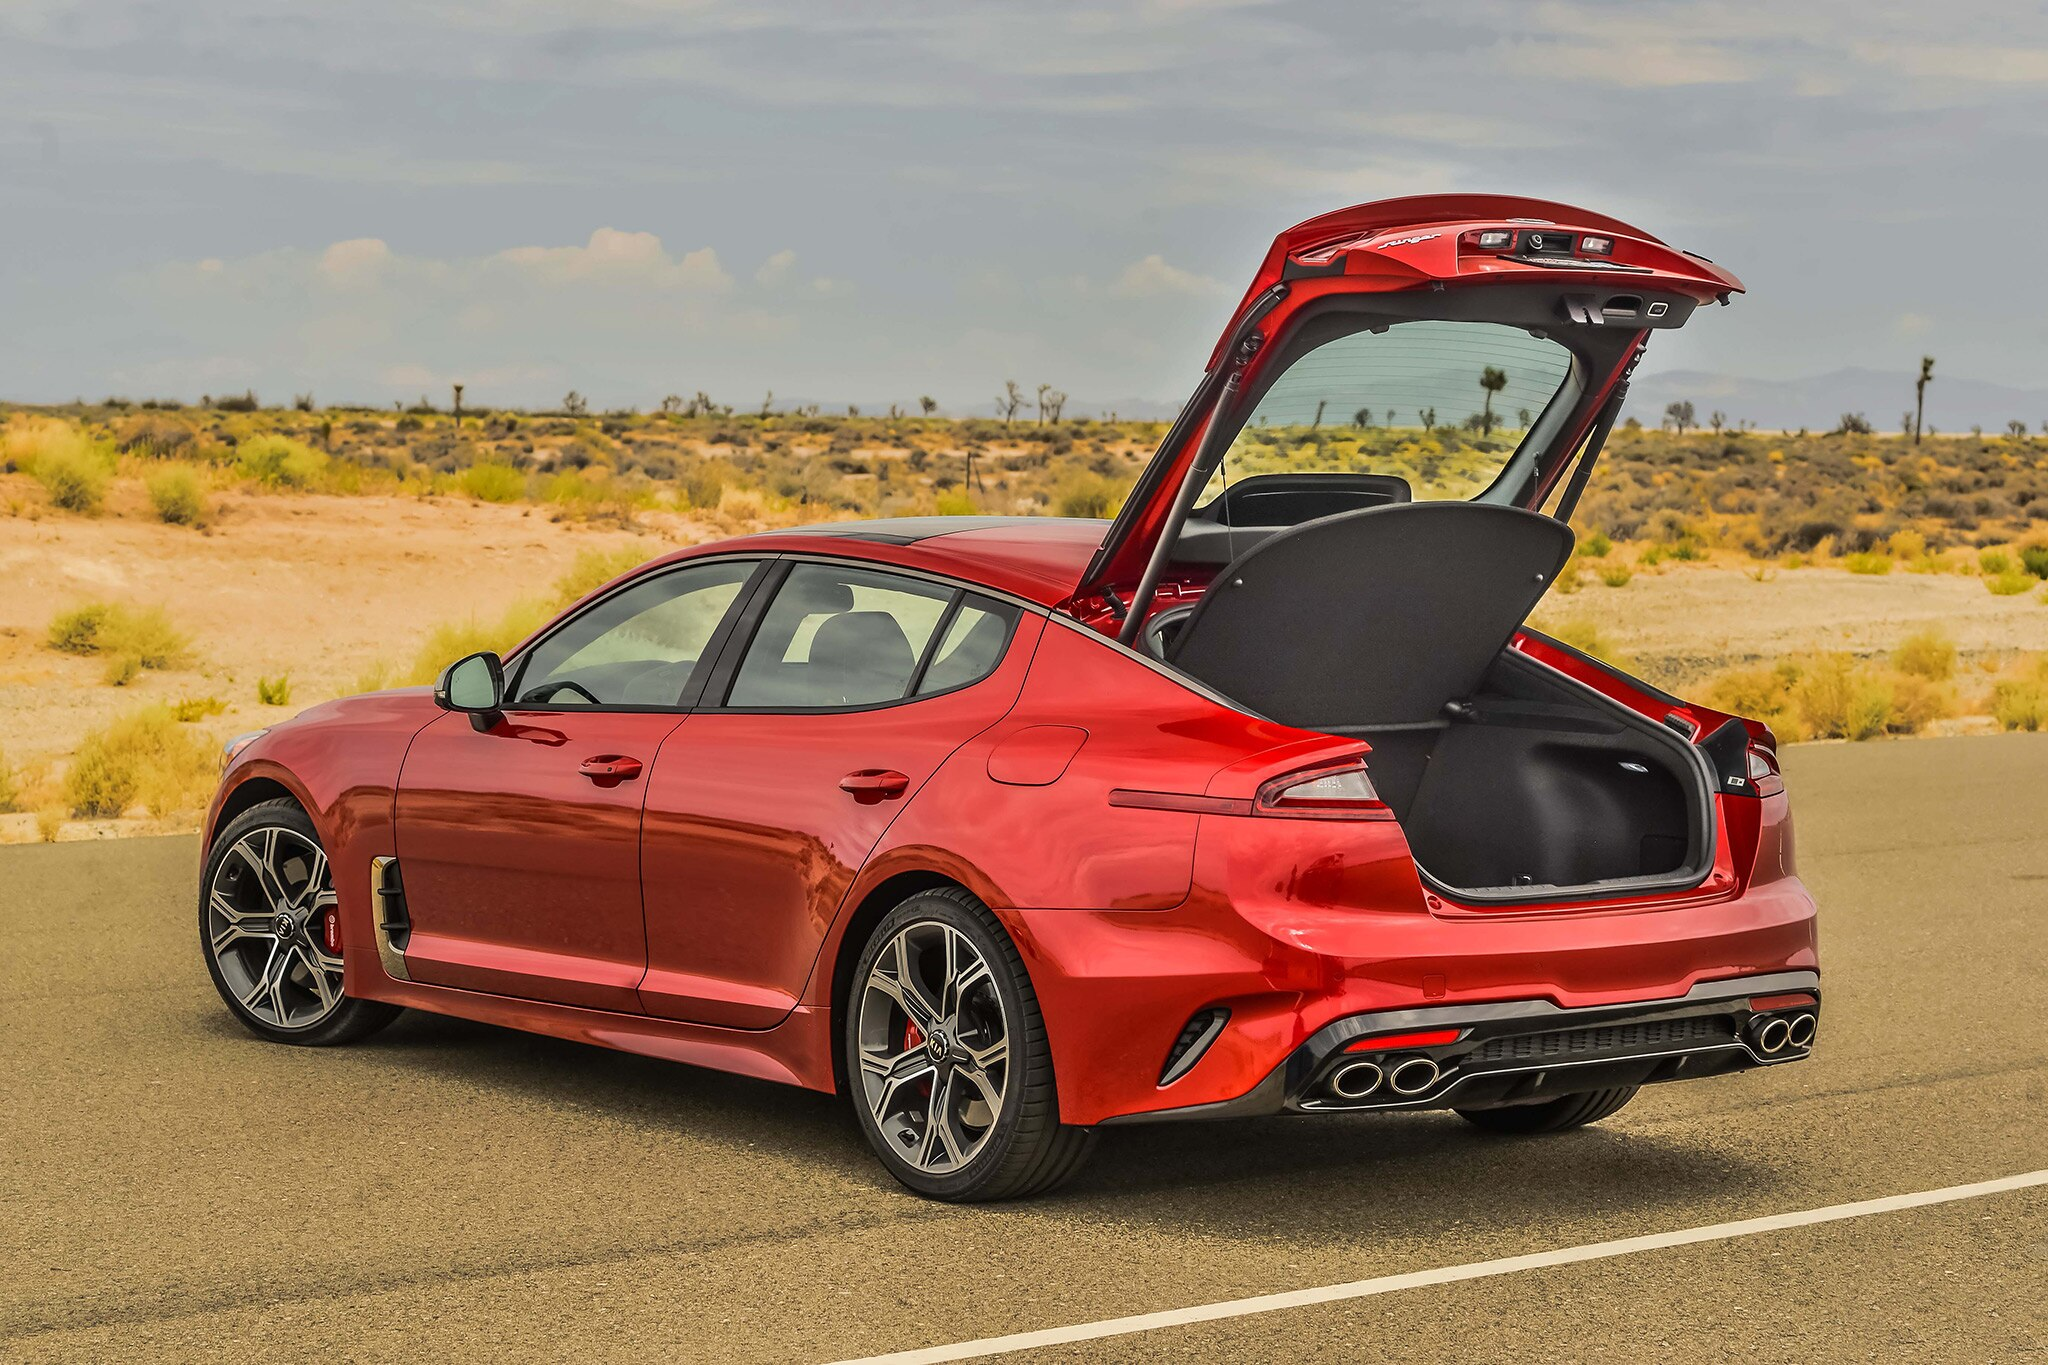 2018 Kia Stinger Gt 3 3t Rwd One Week Review Automobile Magazine